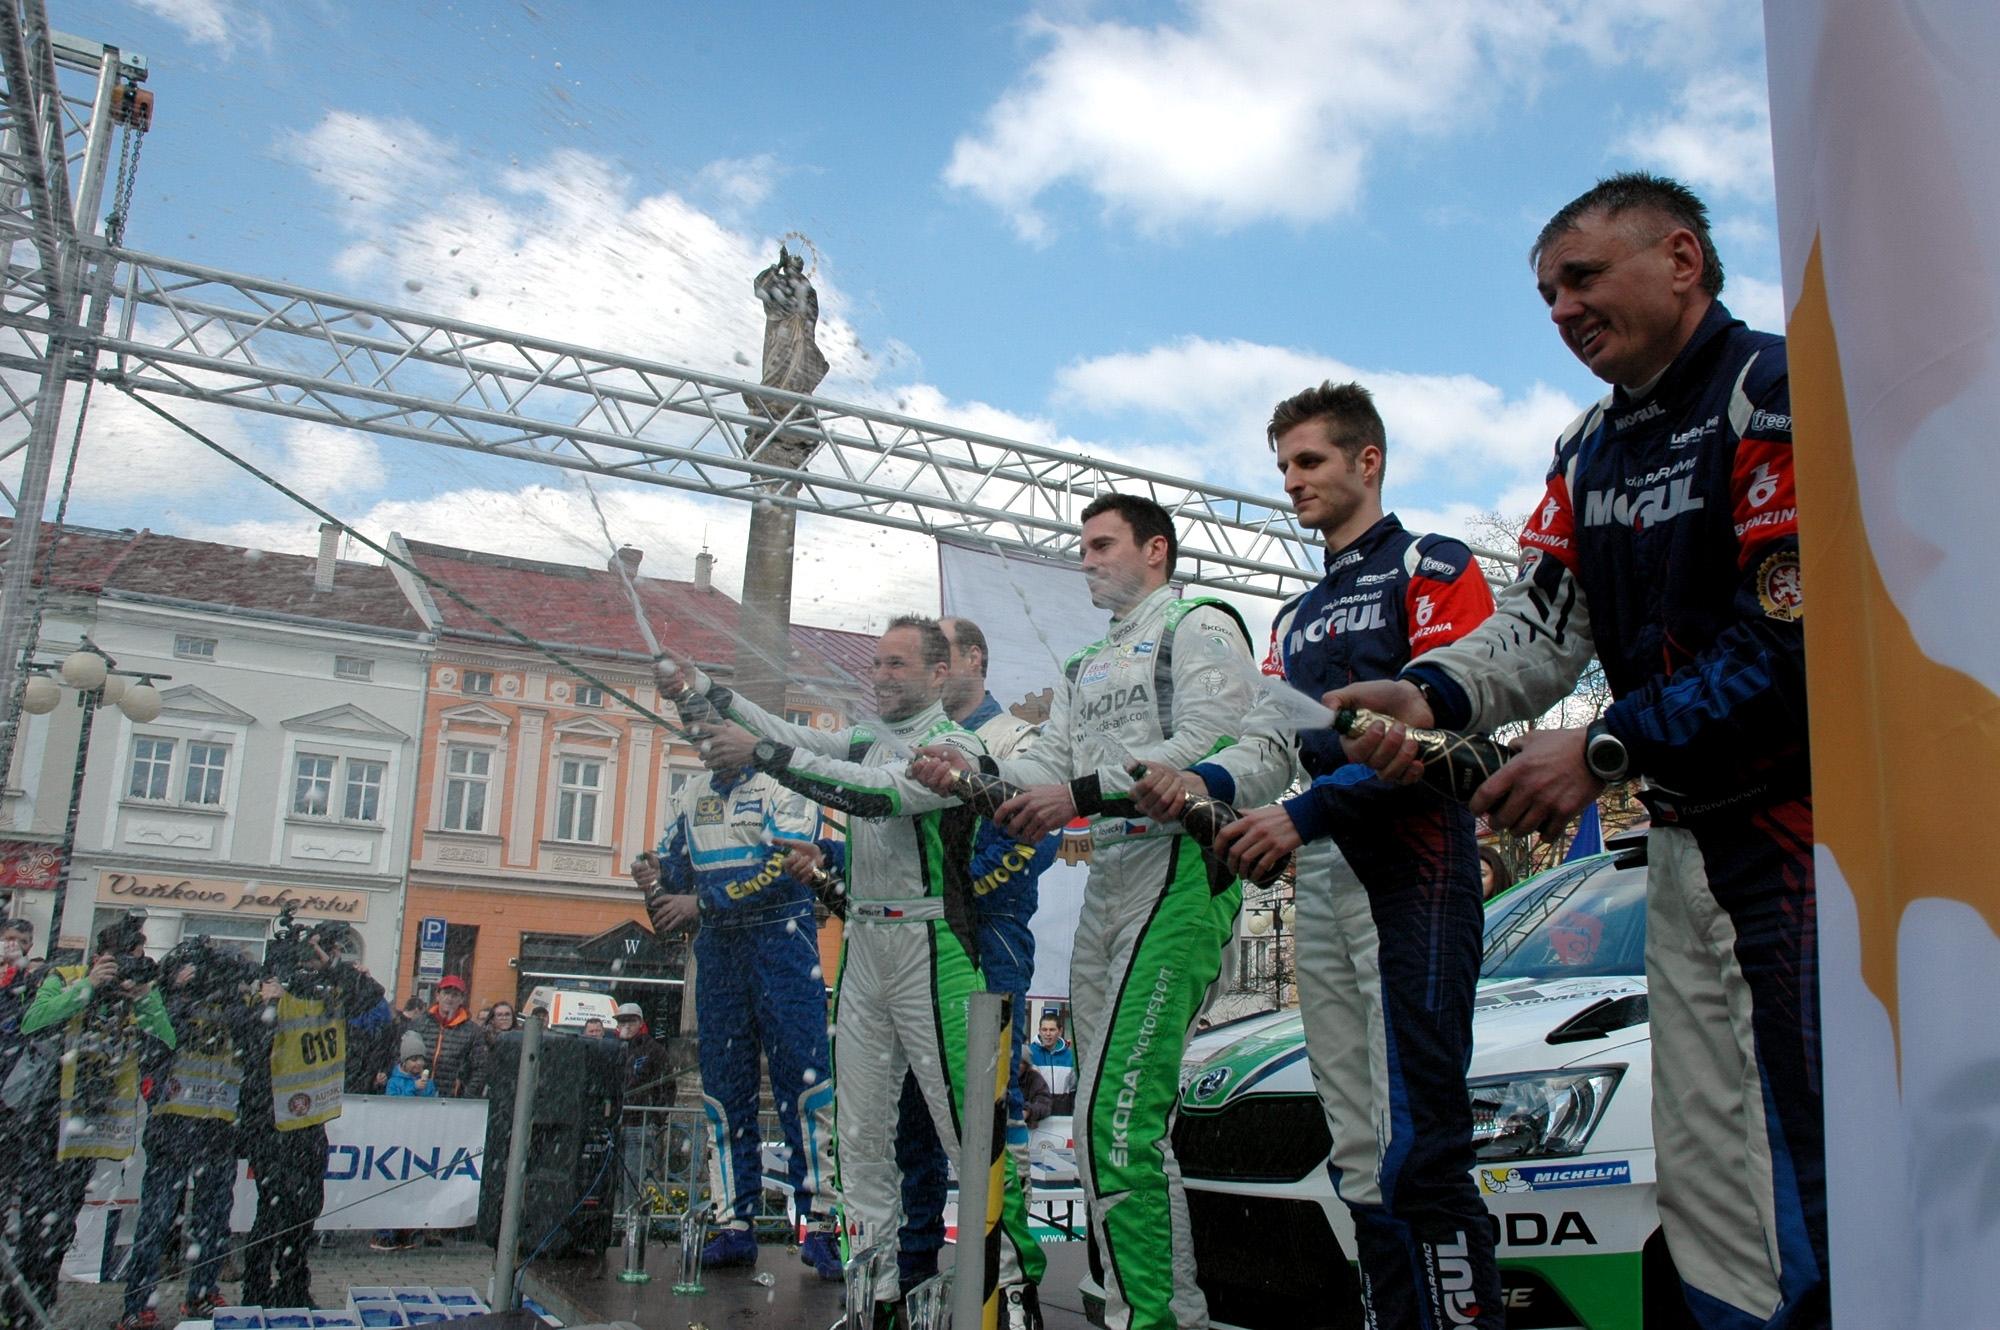 Valašská rally Valmez 2017 - foto Zdeněk Sluka